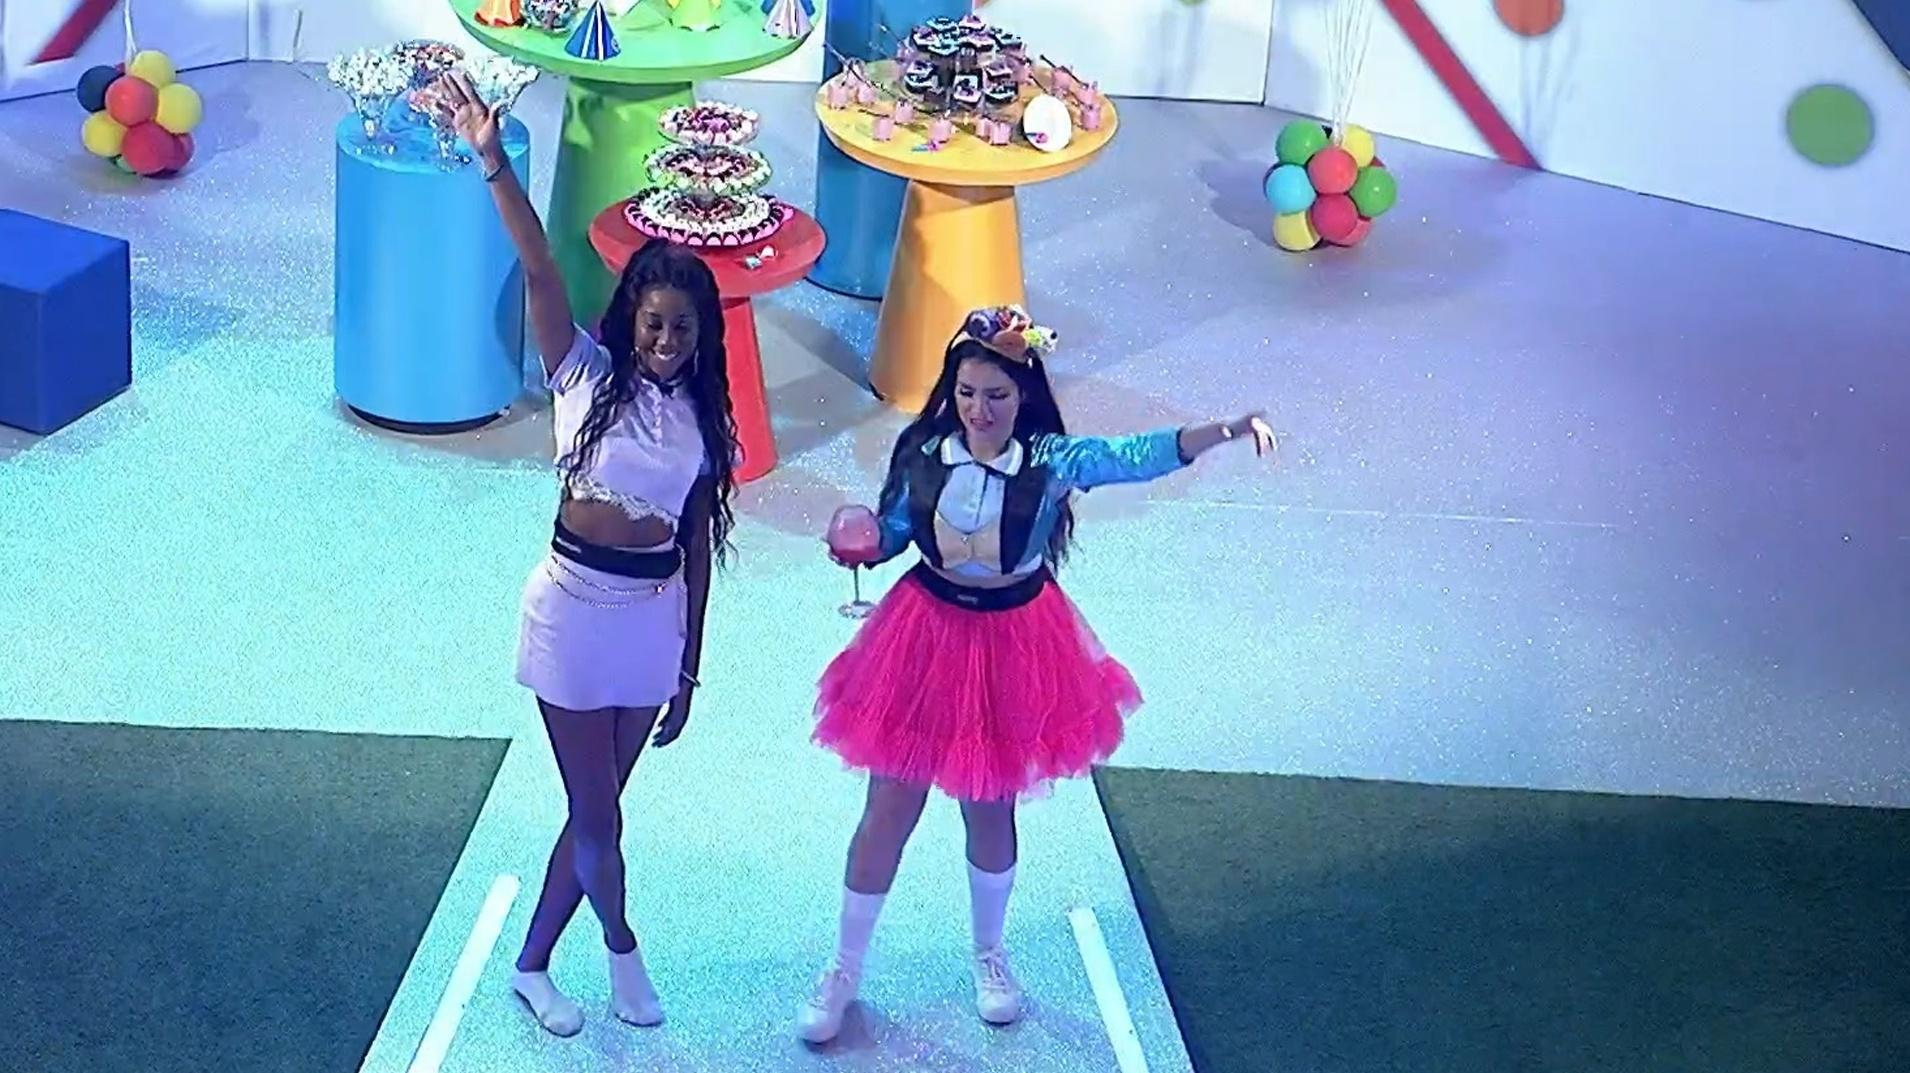 BBB 21: Juliette e Camilla na festa - Reprodução/Globoplay